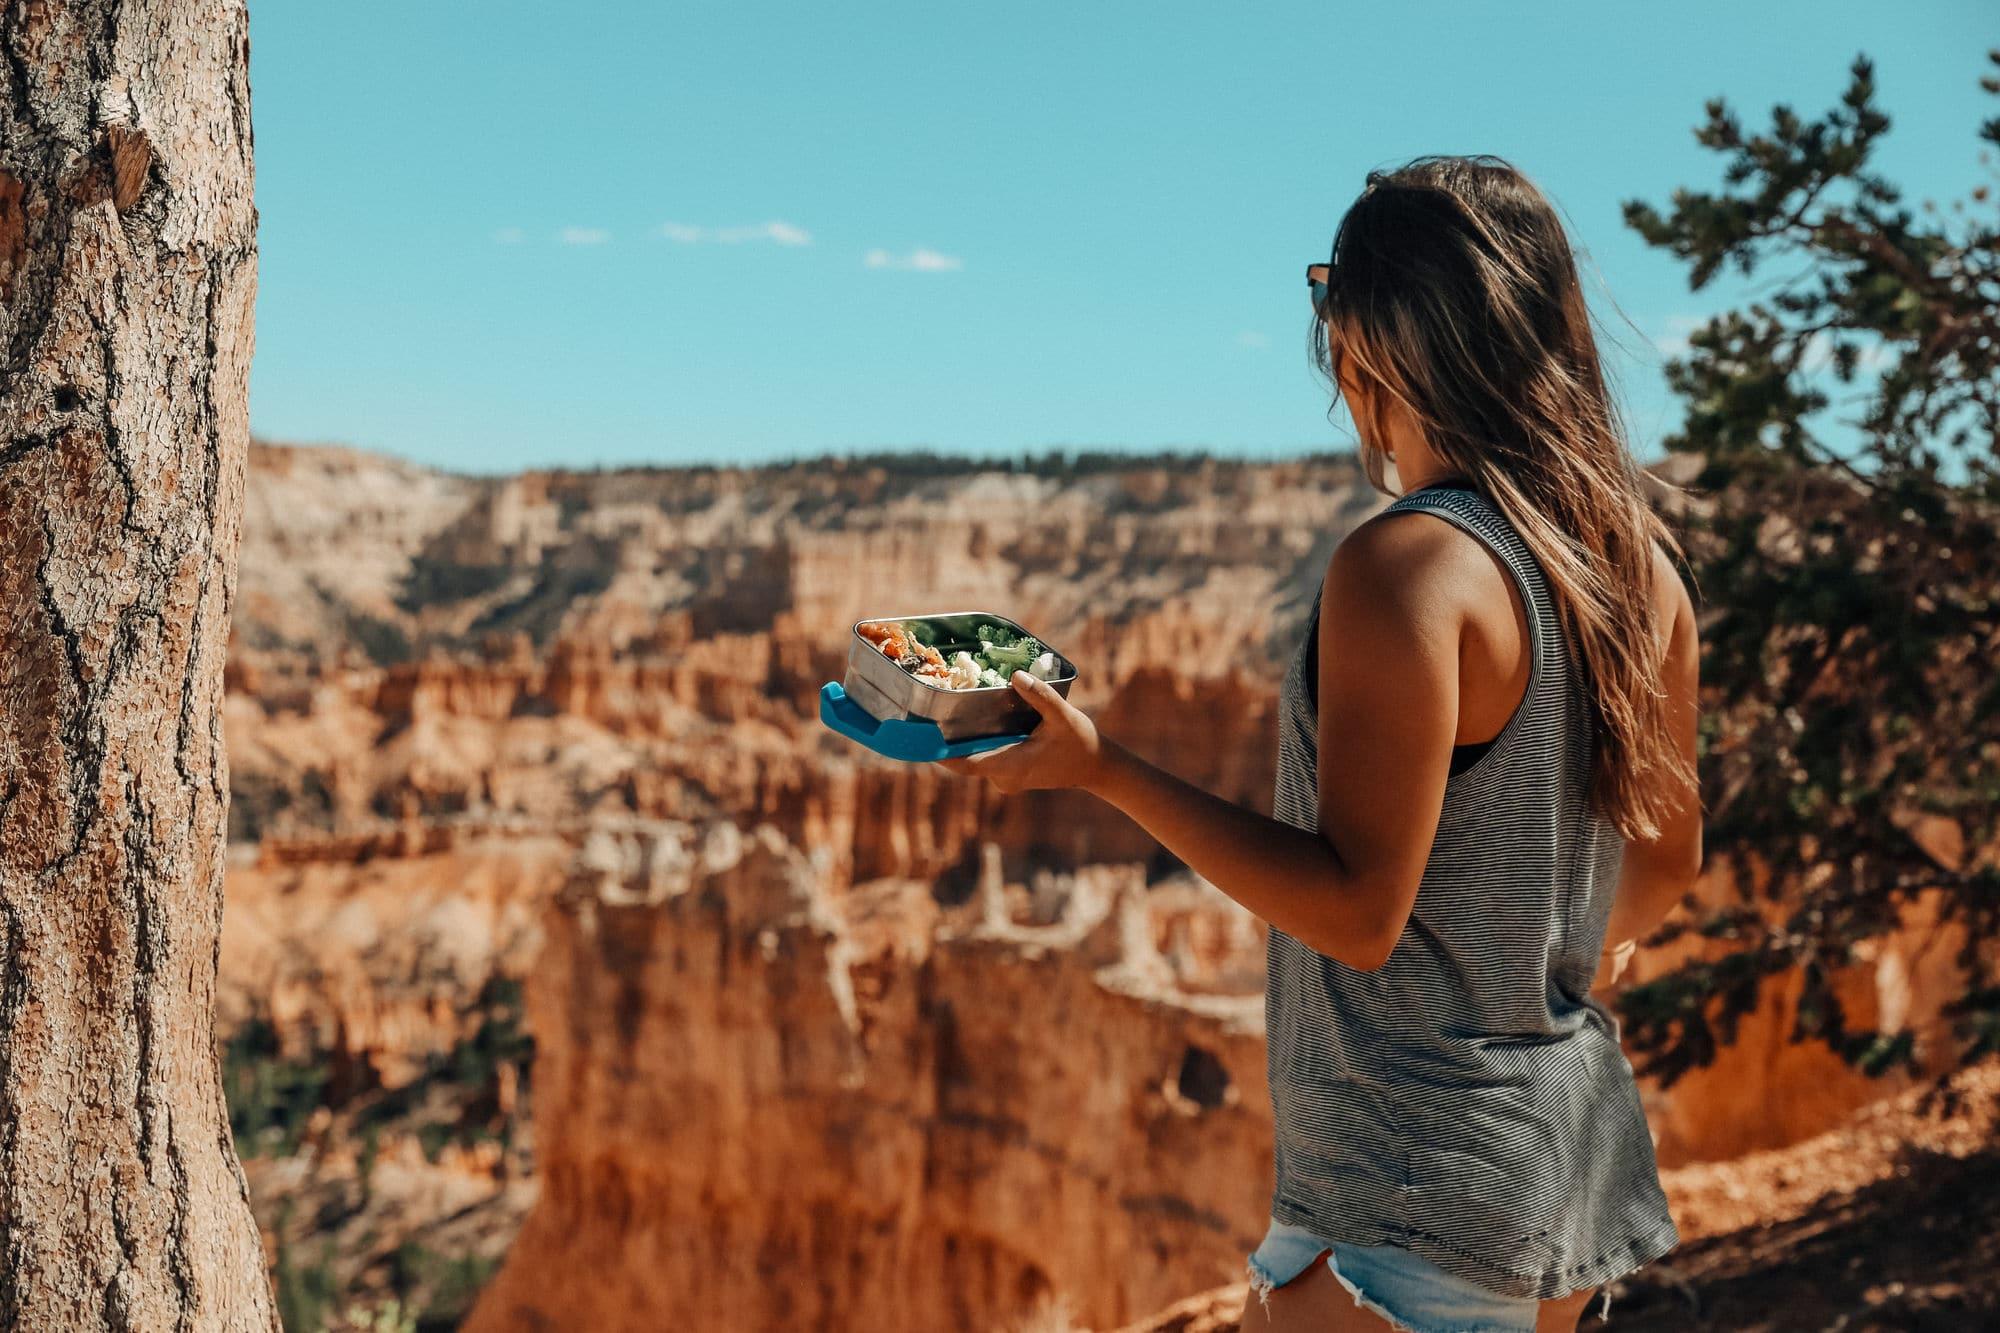 Zero Waste Tips for Hiking